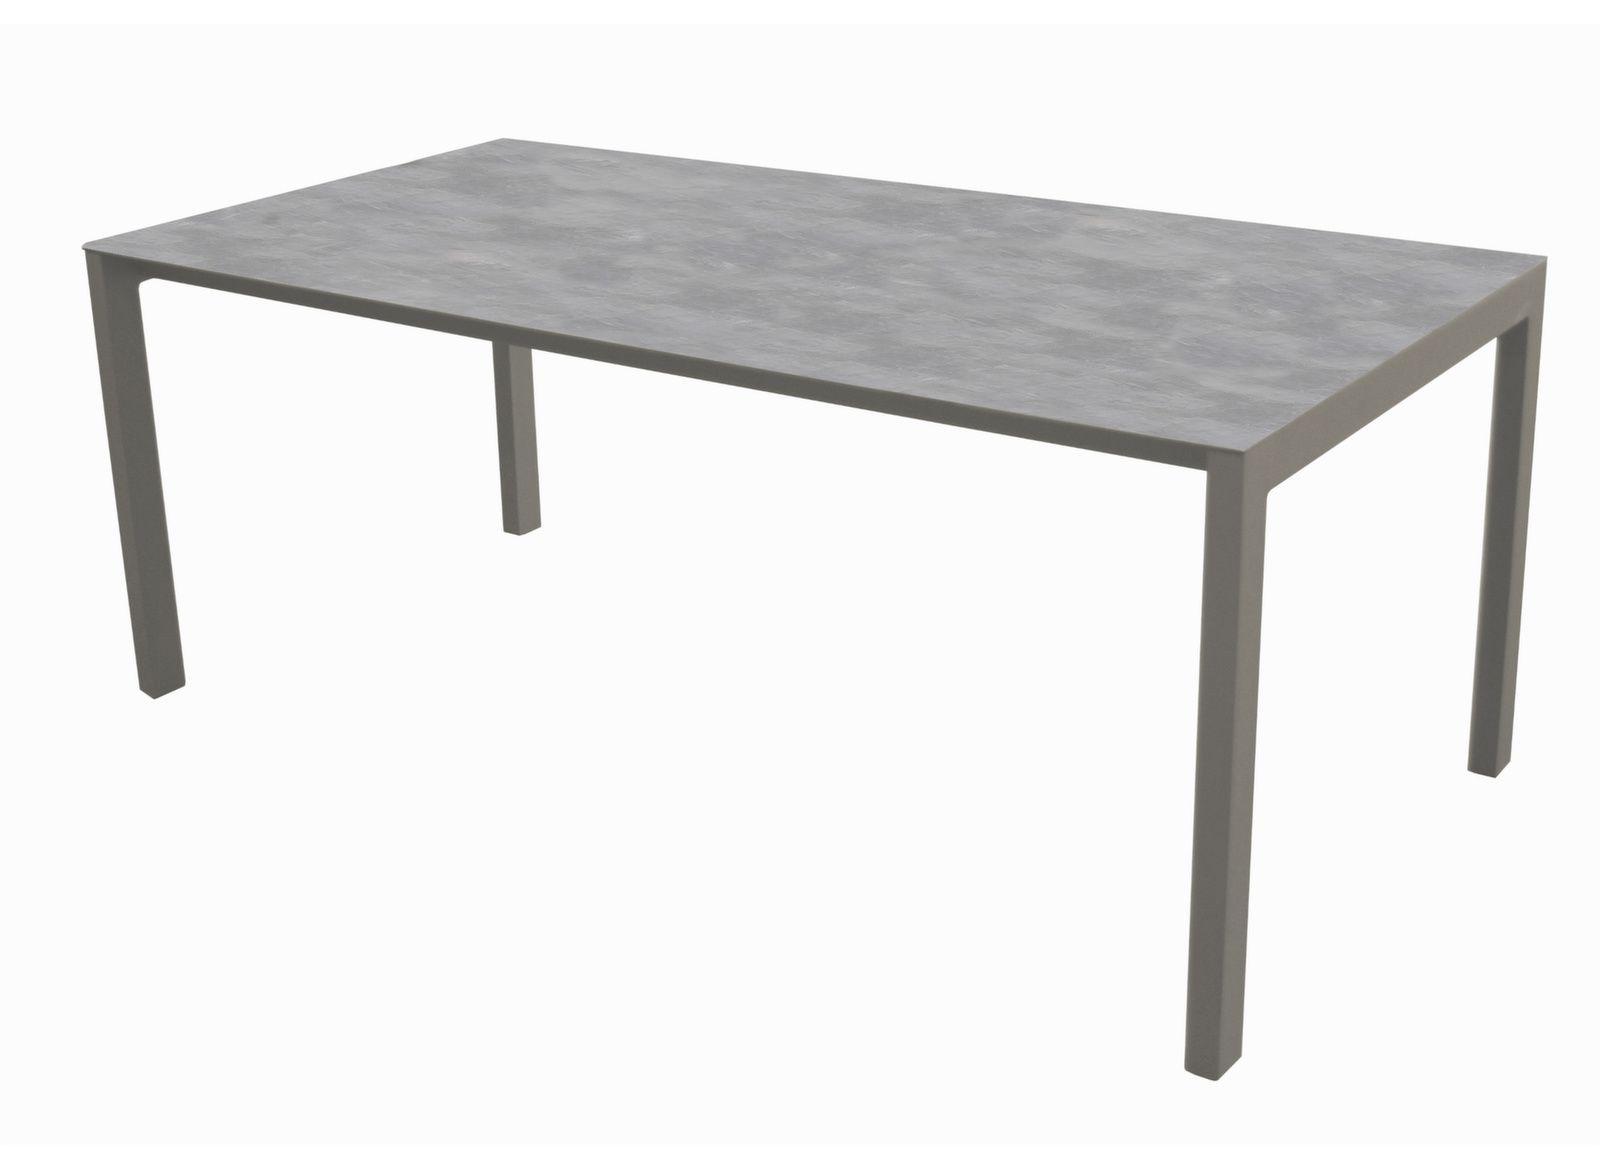 Table de jardin soto 180cm plateau arpa aliz proloisirs for Plateau table 180